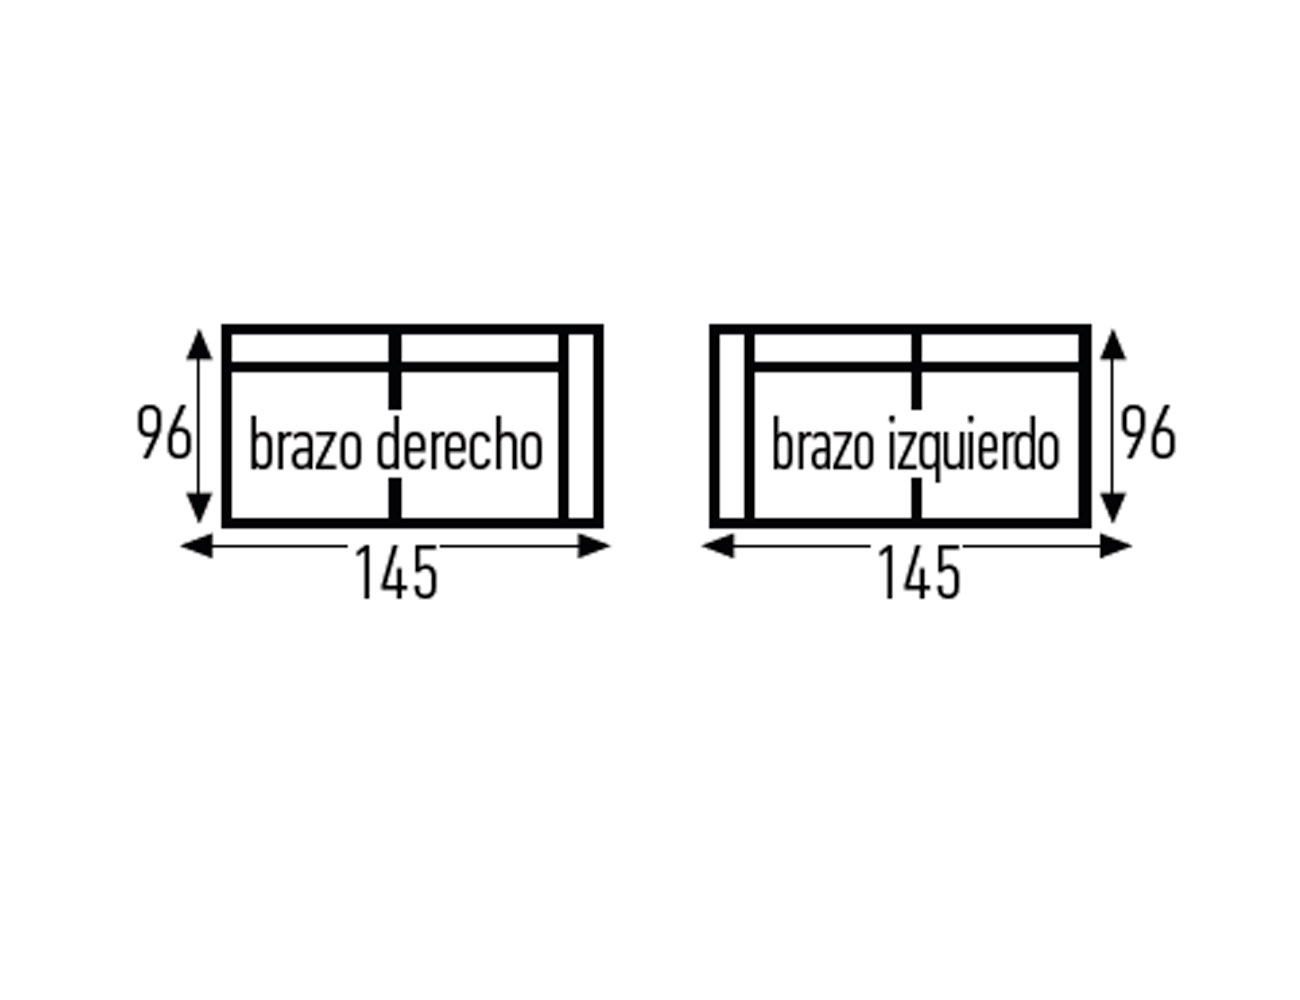 Croquis sofa sin 1 brazo 1452